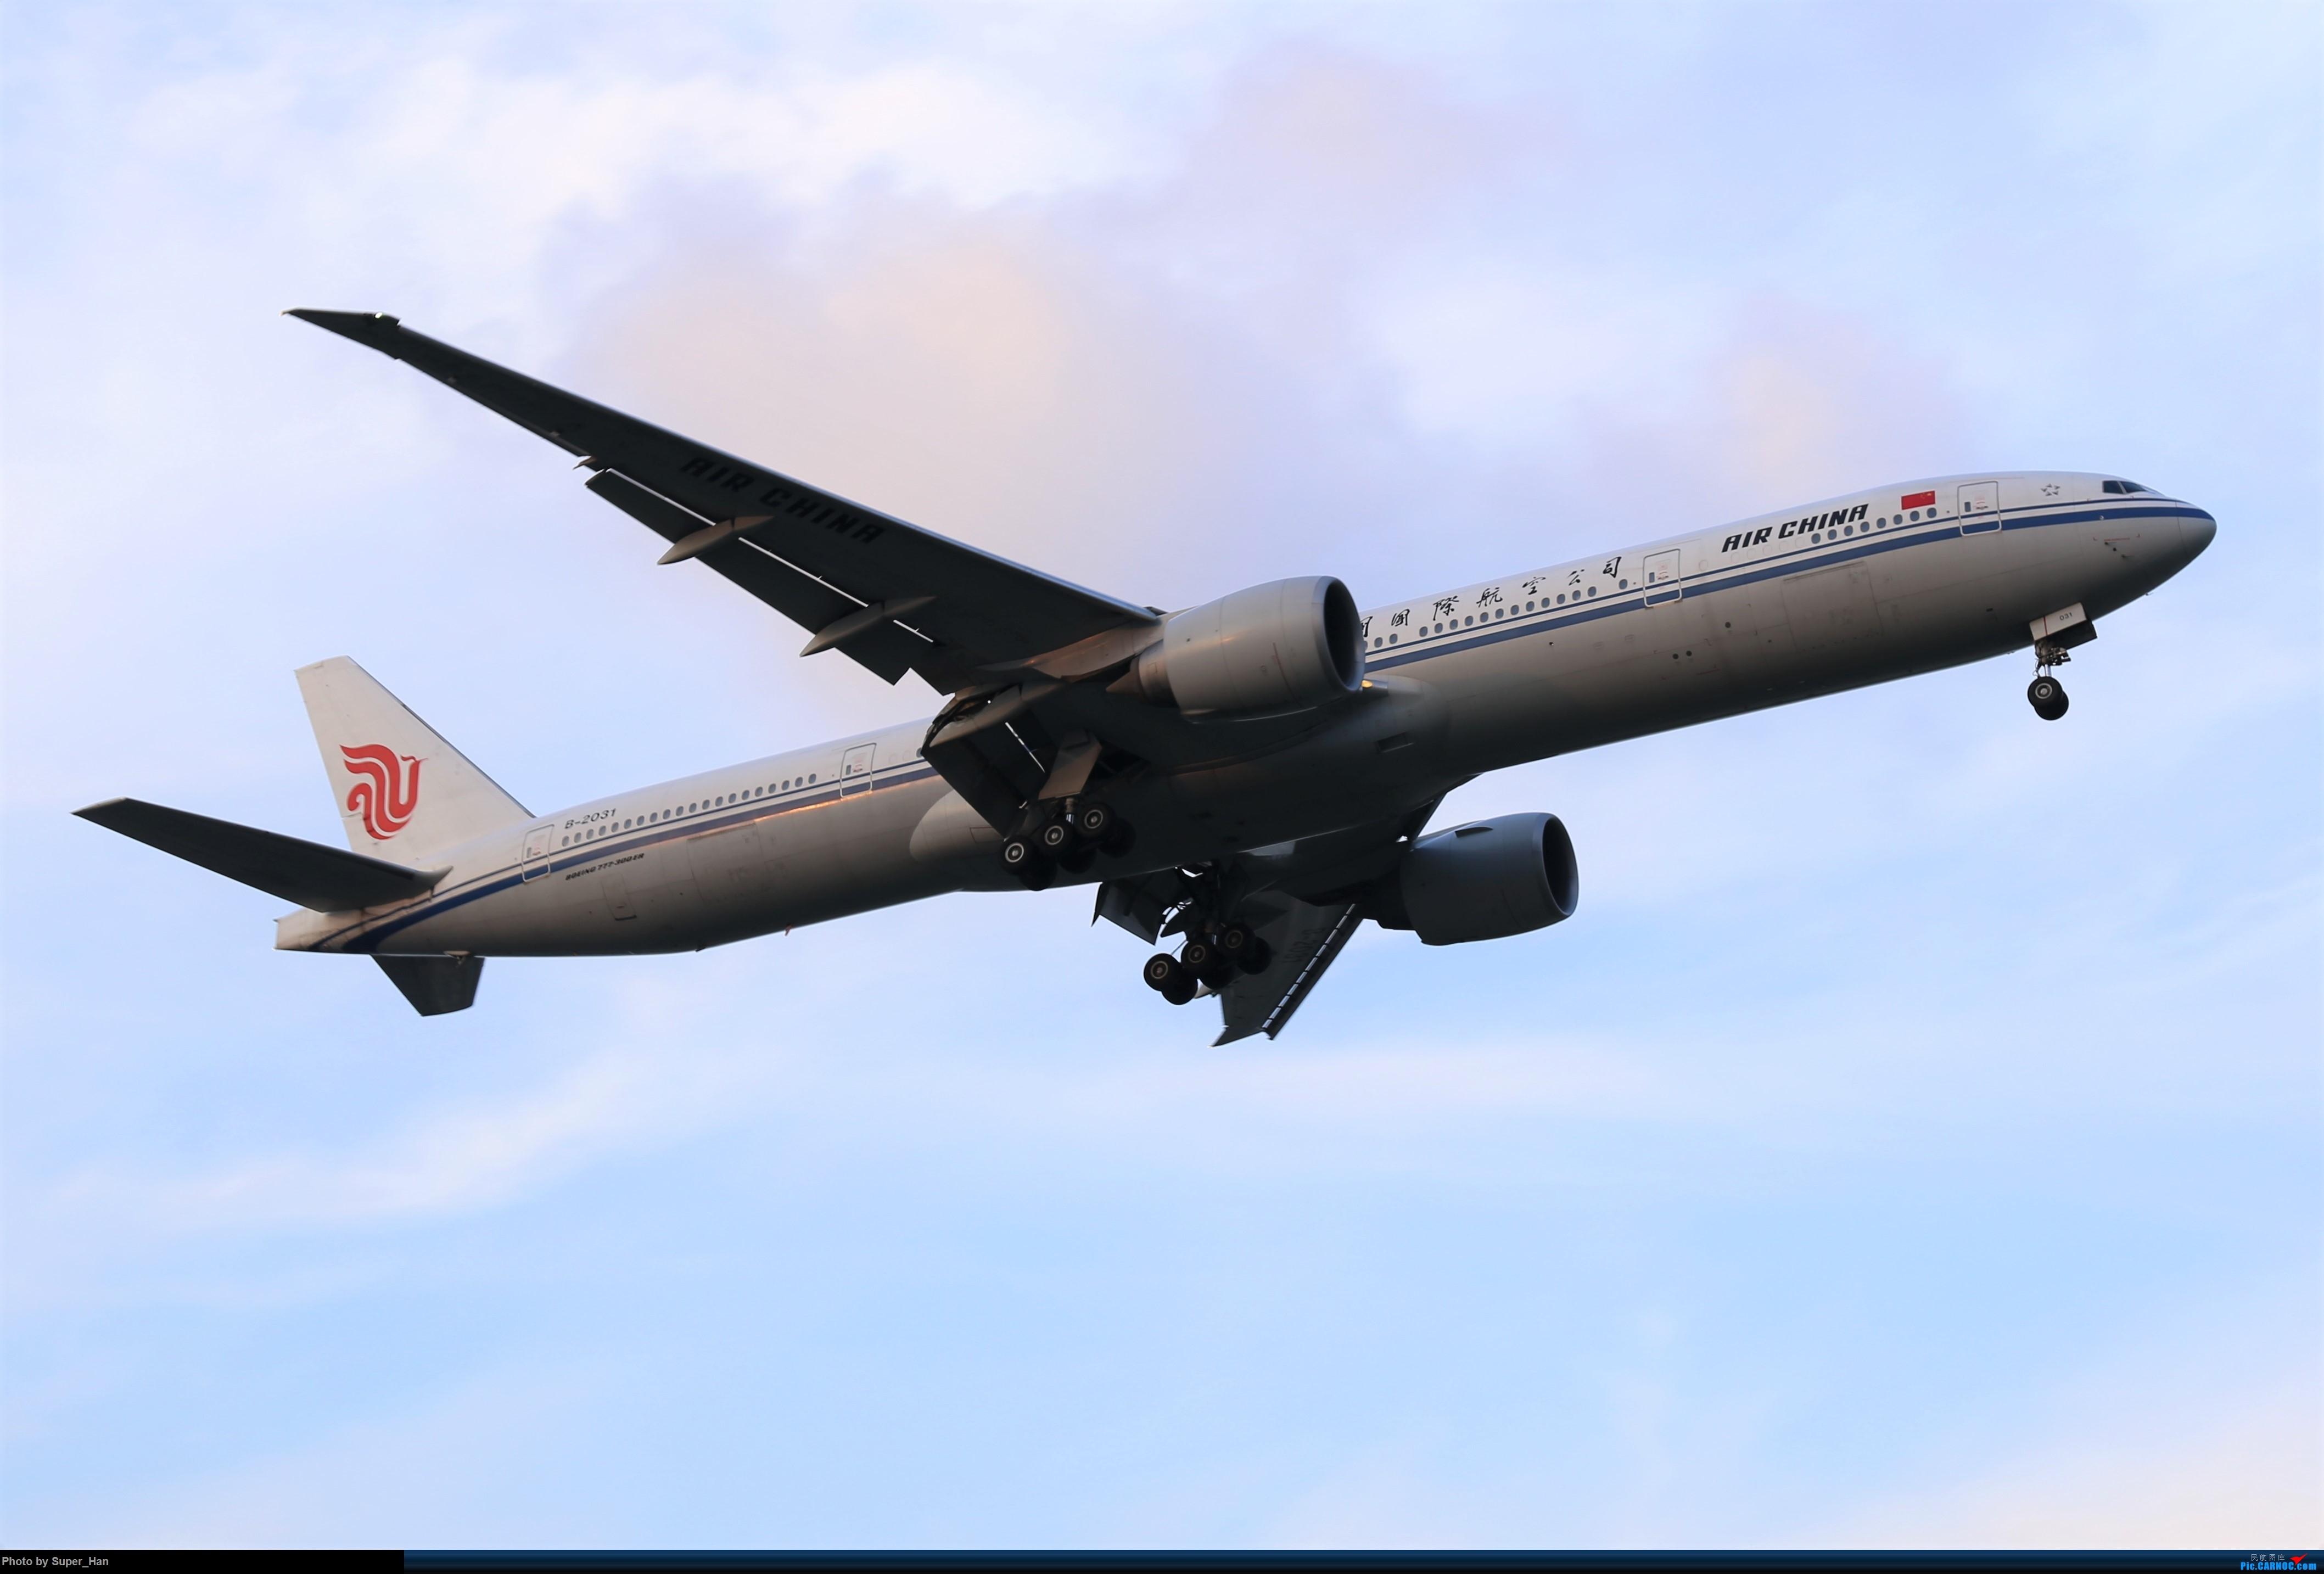 Re:[原创]【杭州飞友会】0715去虹桥说走就走【777篇】 BOEING 777-300ER B-2031 中国上海虹桥国际机场